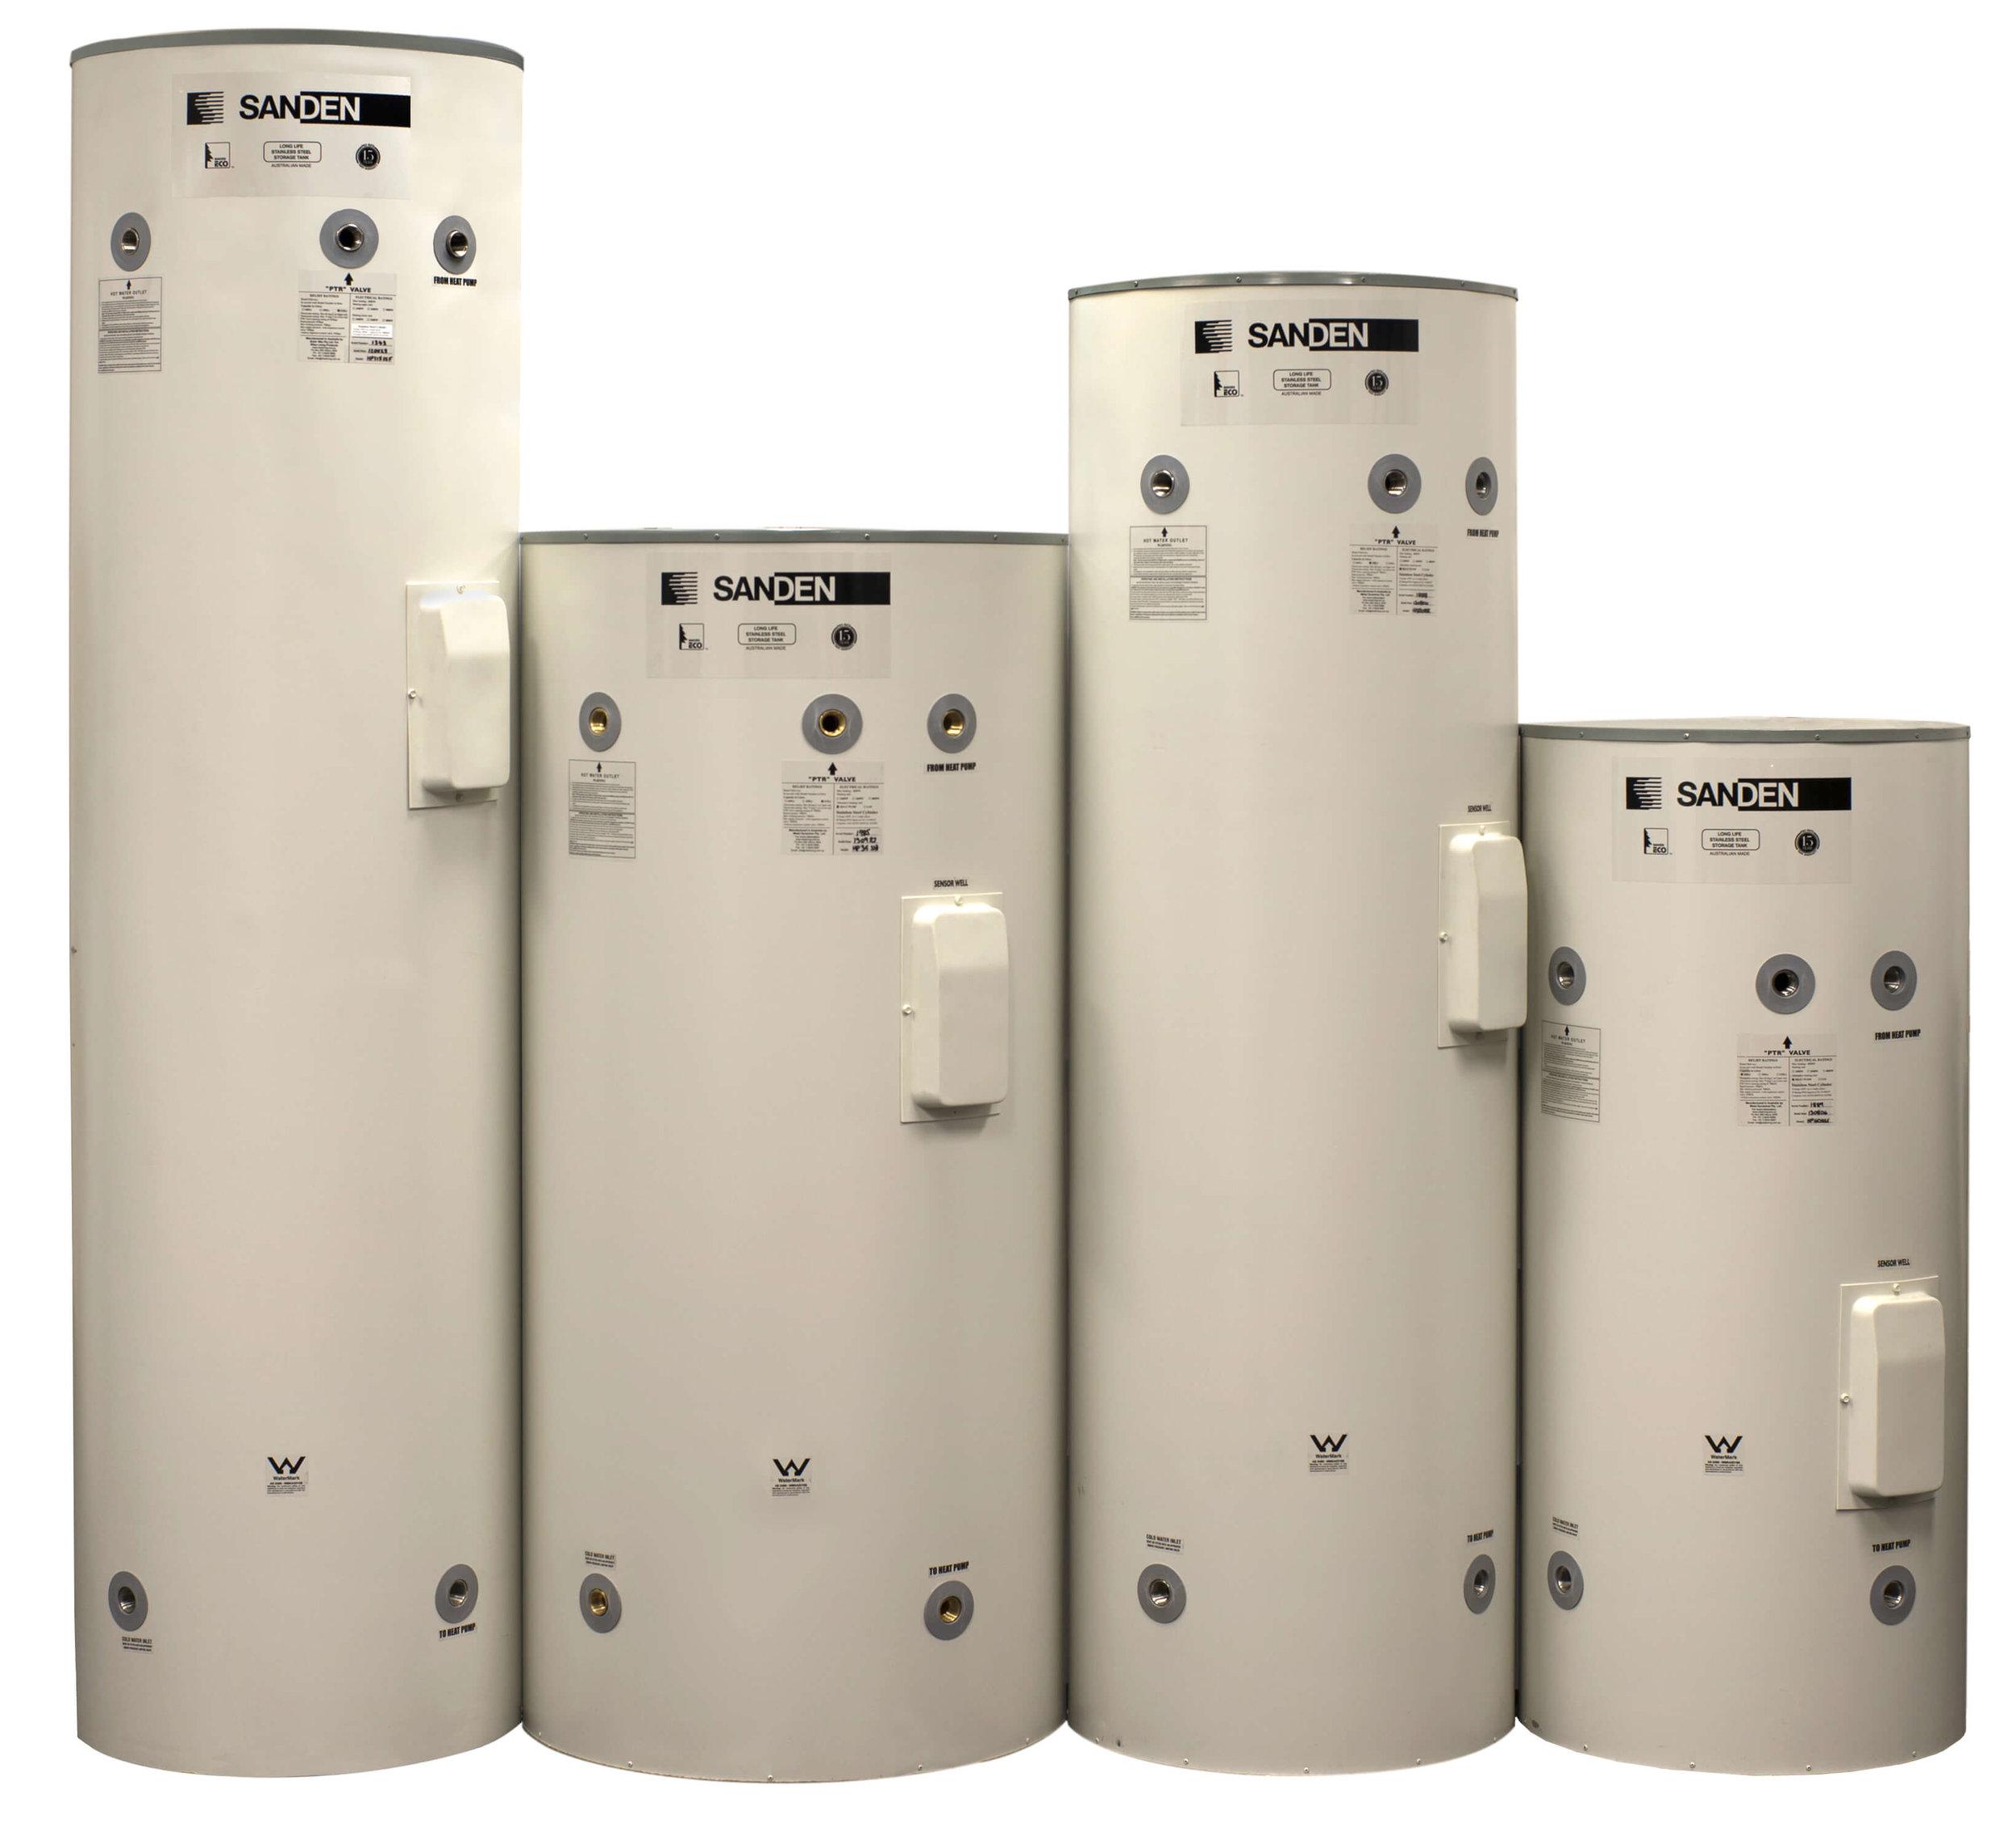 sanden-heat-pumps.jpg